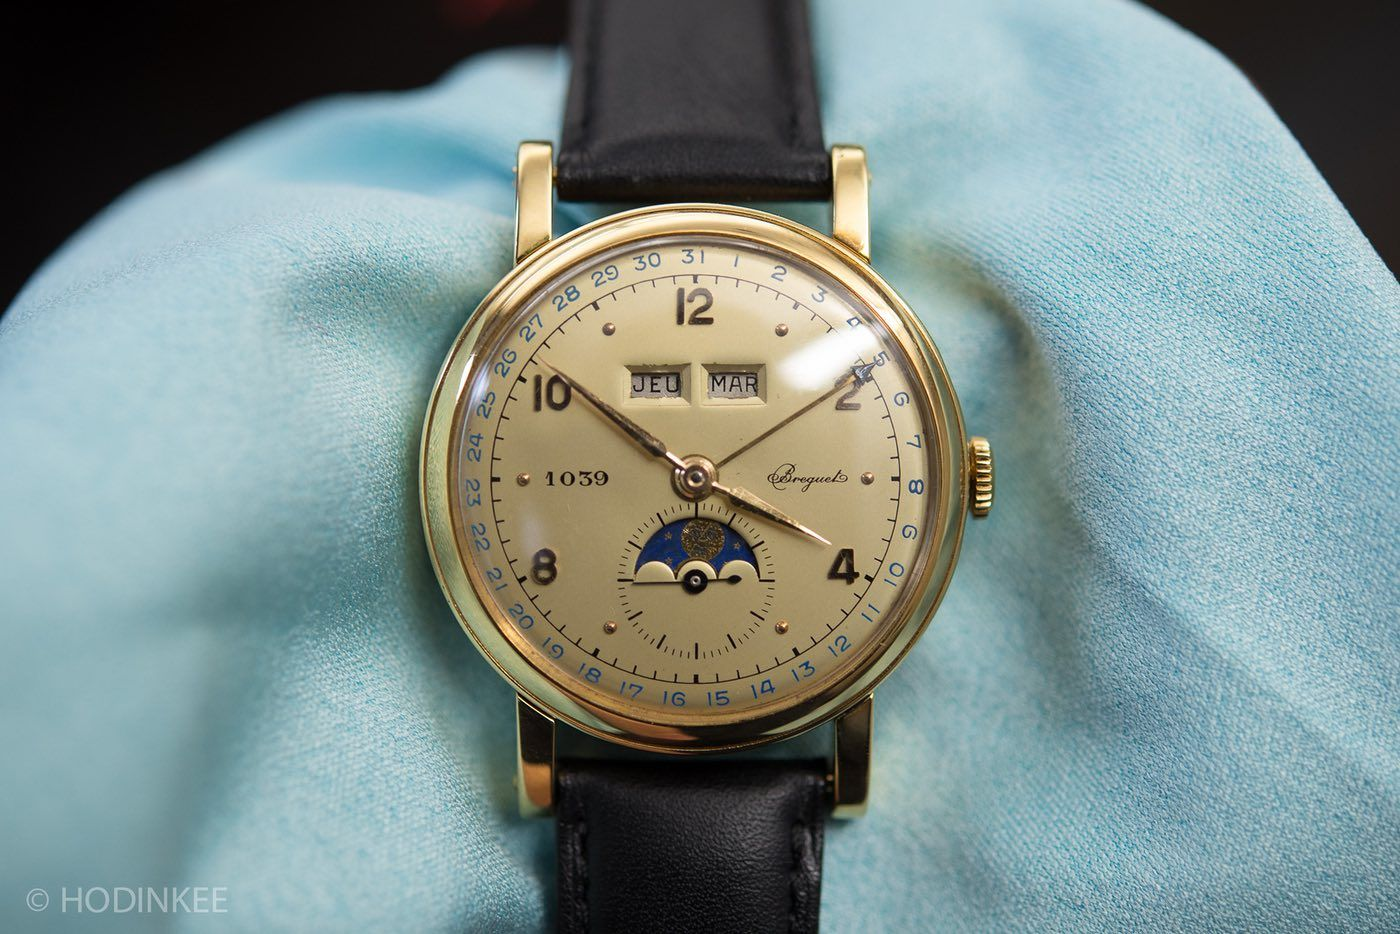 Found Two Super Rare Identical Breguet Watches From The Chaumet Era Hodinkee Watch Sale Patek Philippe Hodinkee